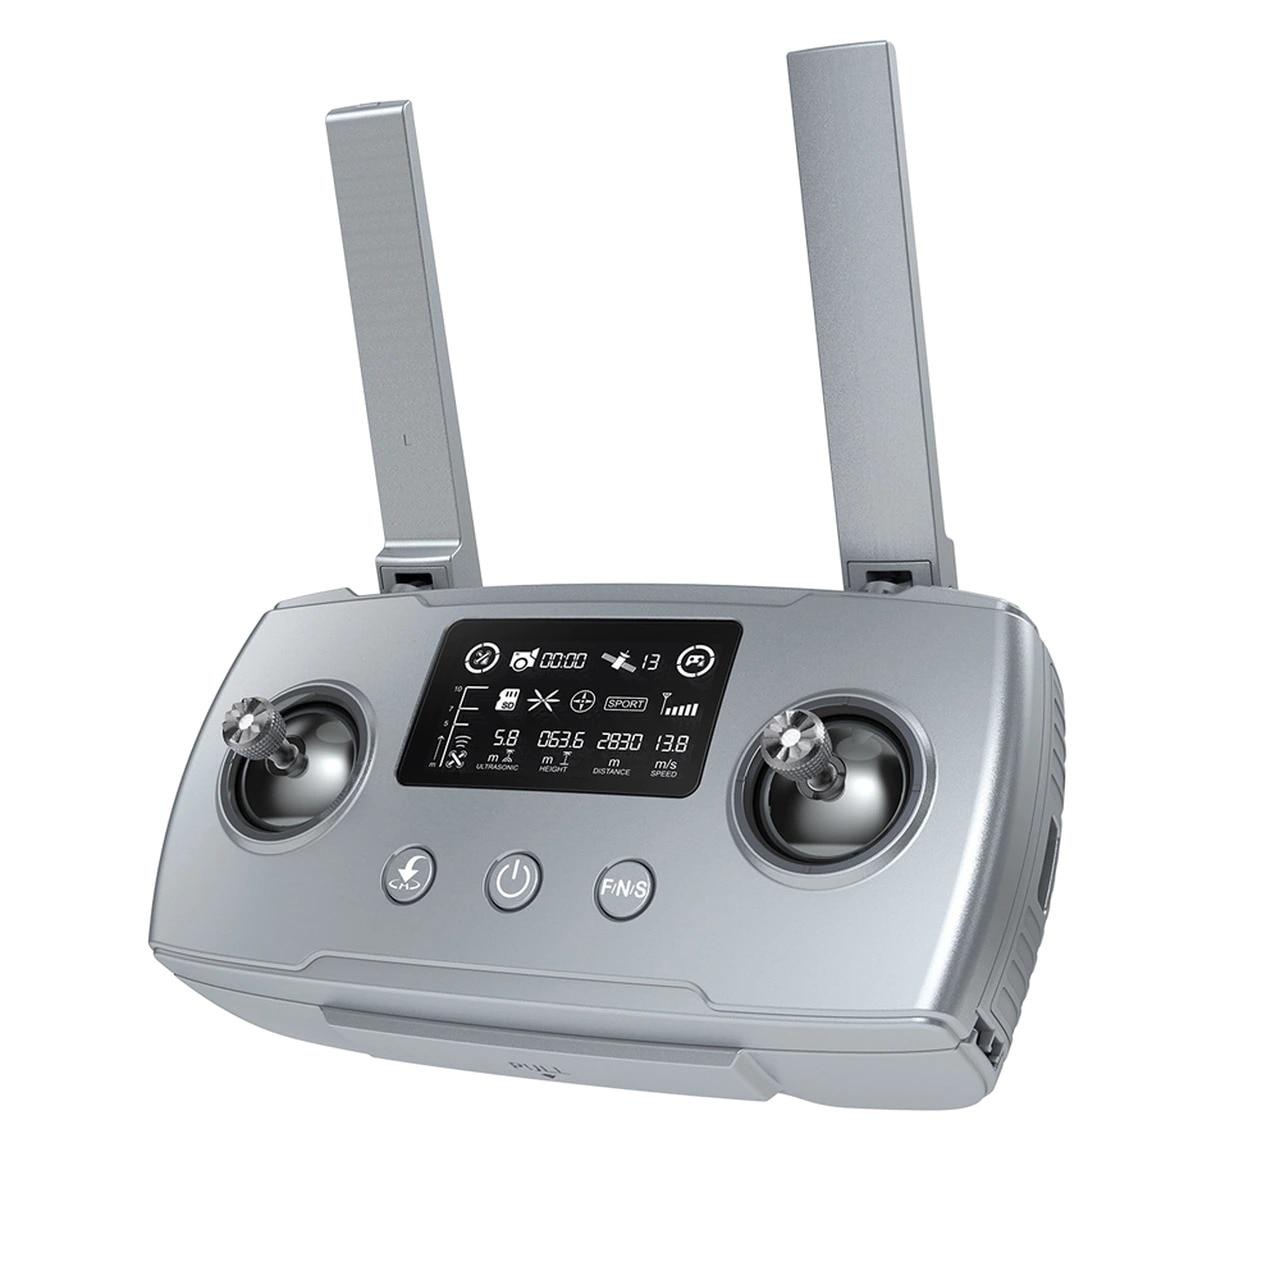 Hubsan Drone ZINO Mini PRO 249g GPS 10KM FPV 4K 30fps Camera 3-Axis Gimbal RC Quadcopter Discounts Code: LF15AS5OAPT5 4